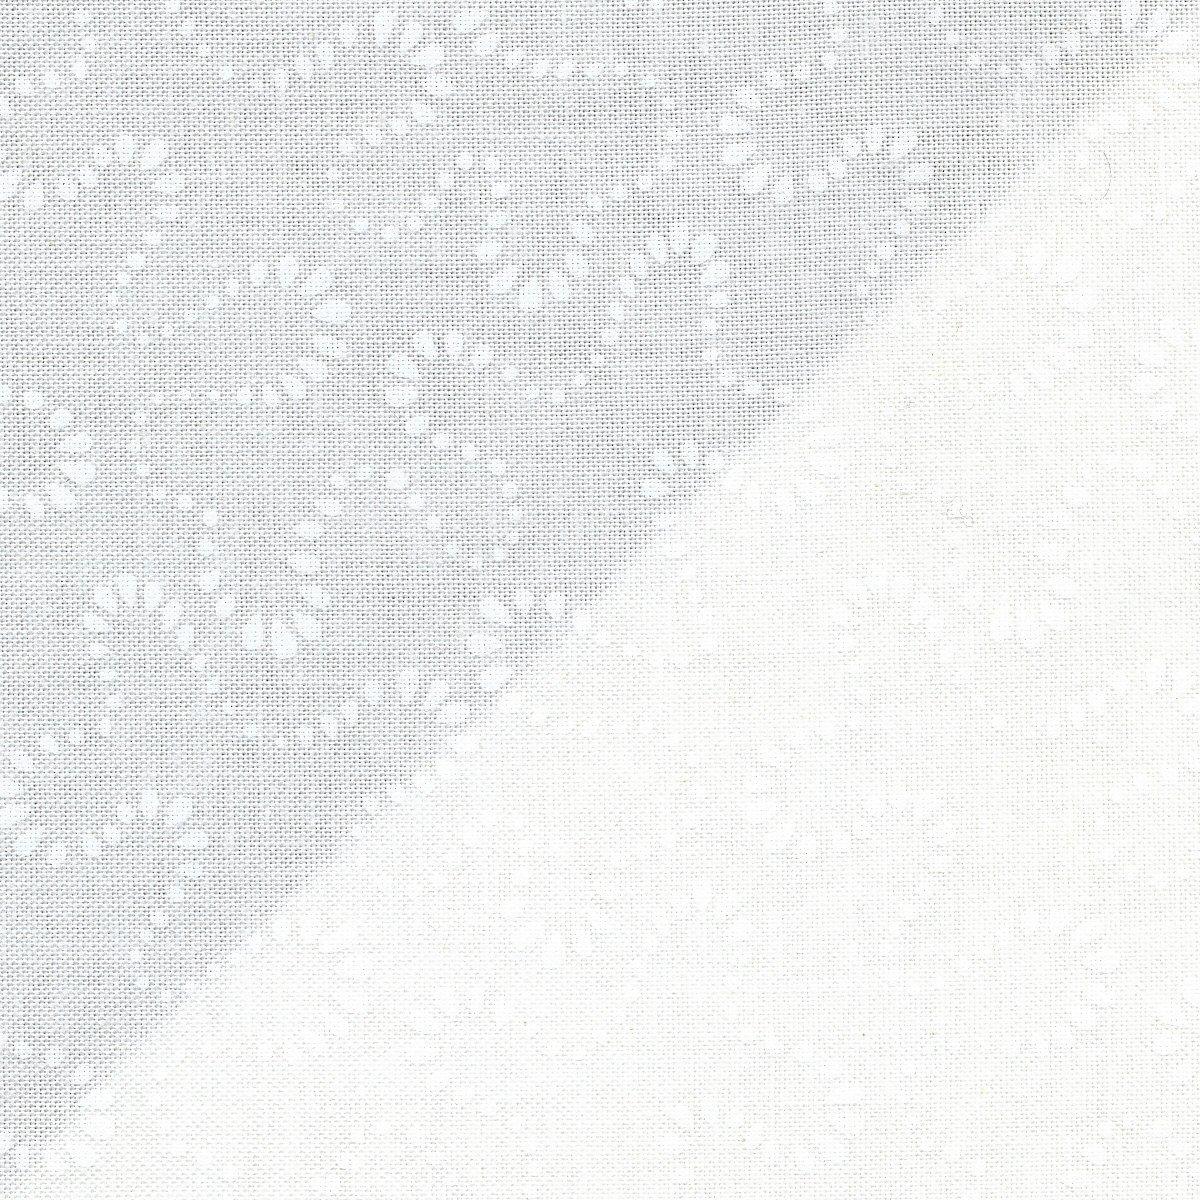 Solitaire Whites - MAS206-SW